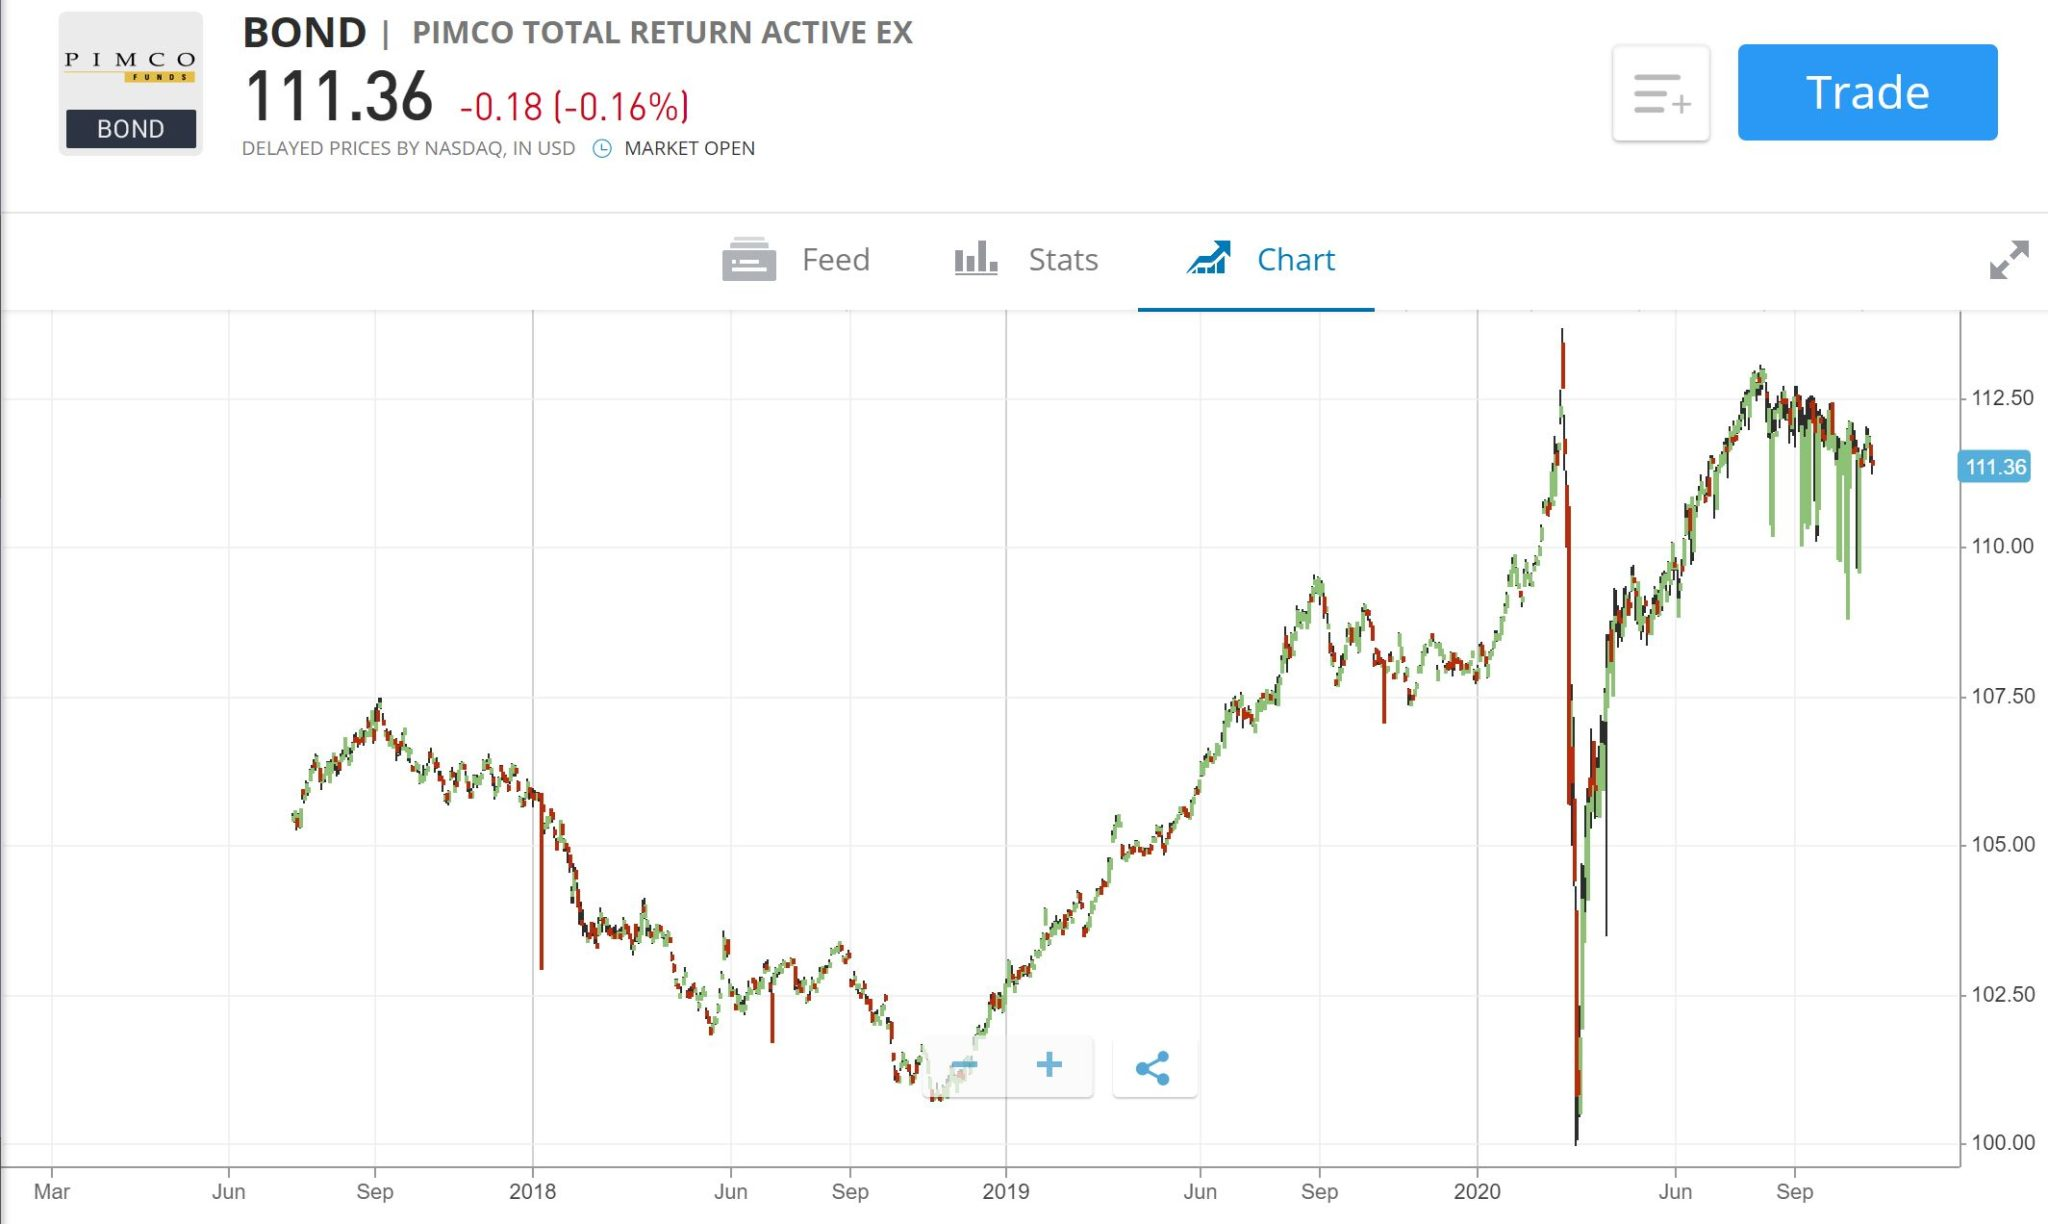 Pimco Corporate Bond ETF price chart